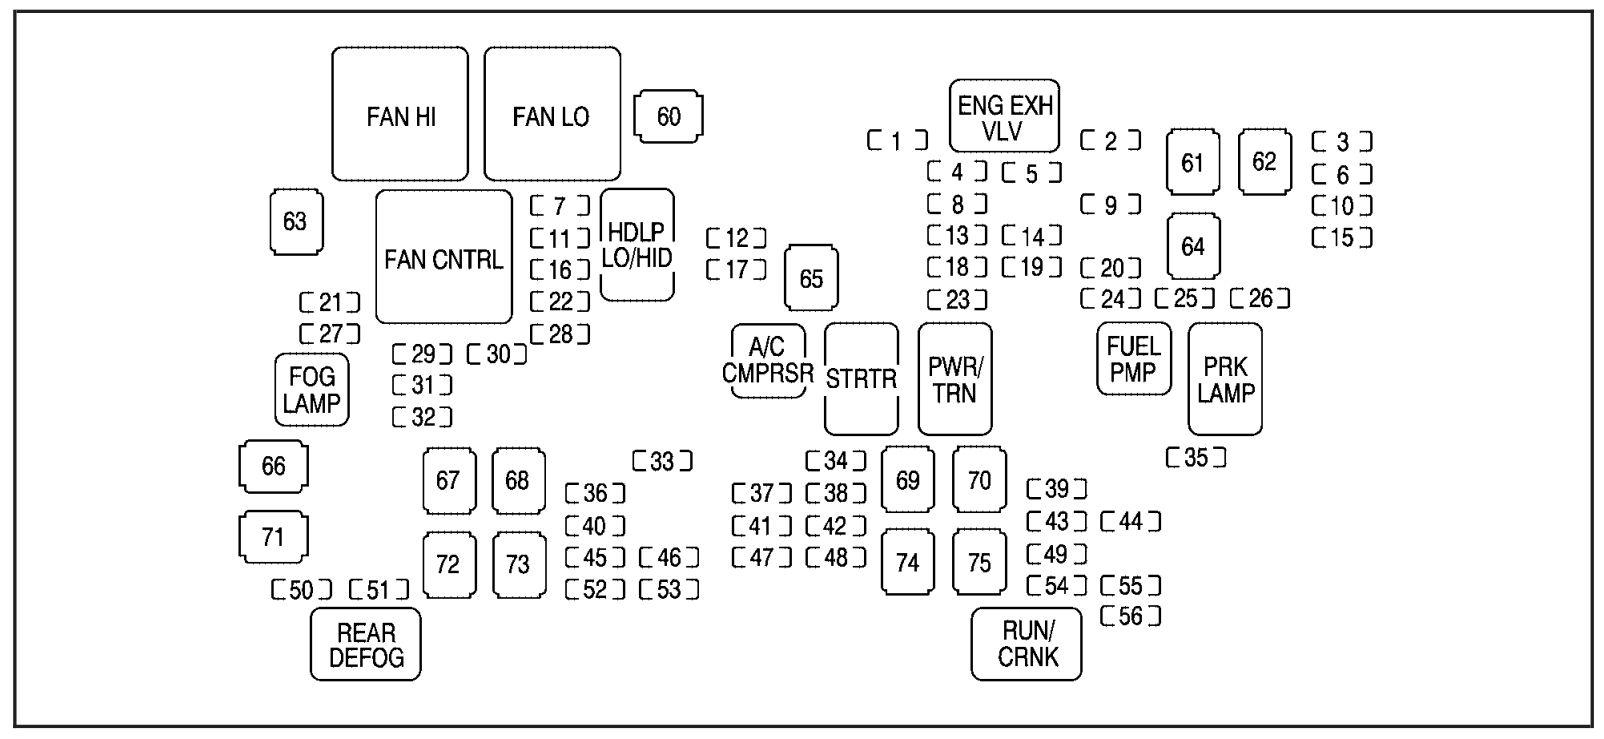 [ZHKZ_3066]  HL_7530] 2005 Suburban Fuse Diagram Wiring Diagram | 2007 Silverado Fuse Box Diagram |  | Drosi Numap Mohammedshrine Librar Wiring 101